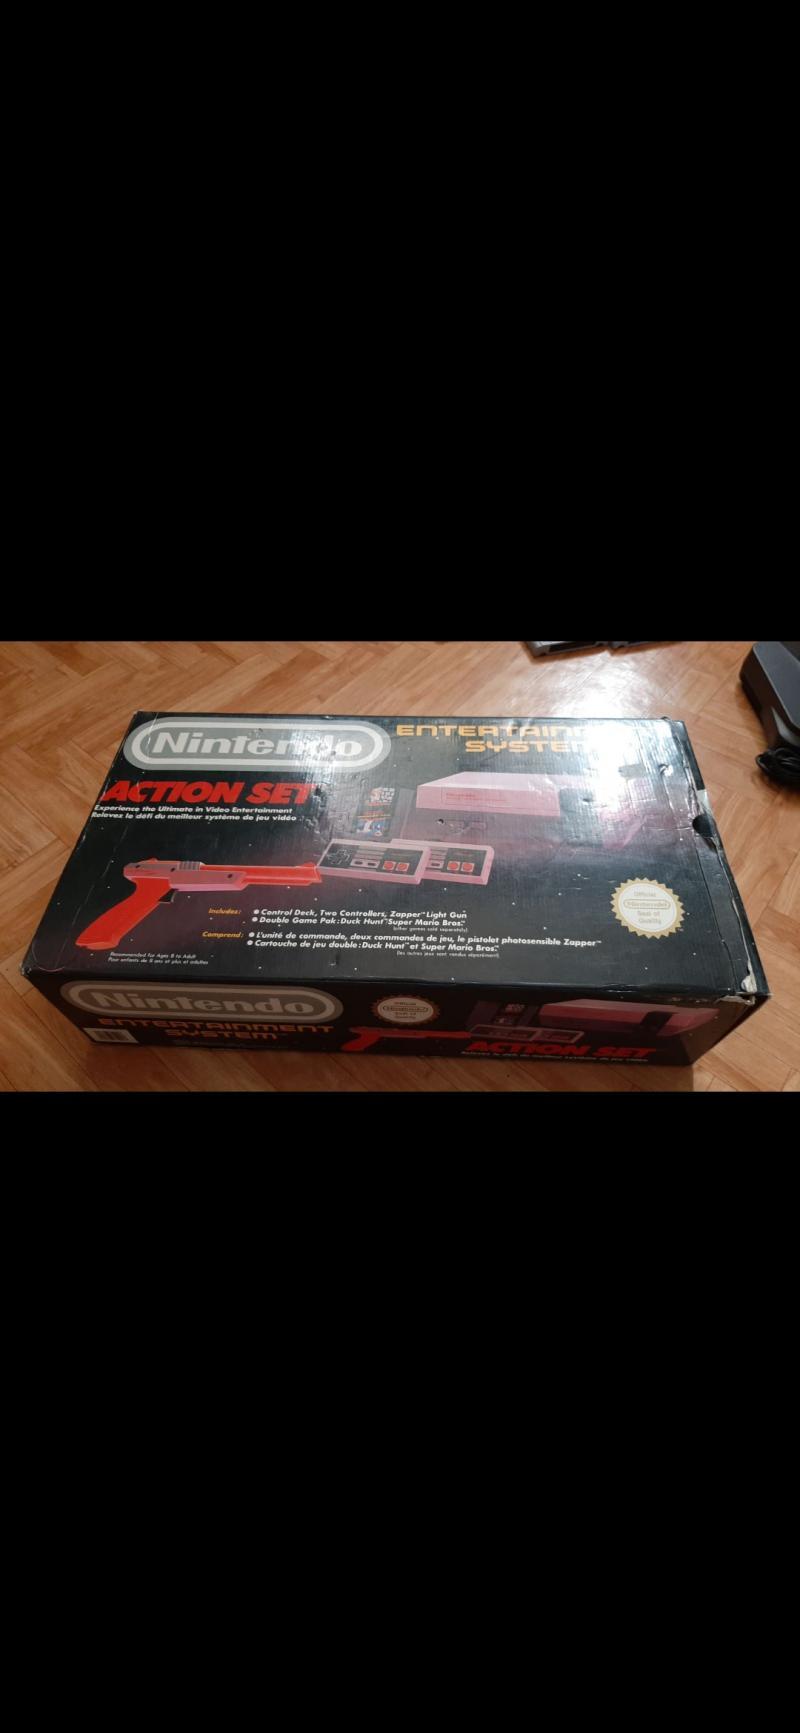 (VDS) grot lot nintendo 64 console en boite,jeux en boite,80 jeux en loose JEUX NES en boite!! 9Dnrl